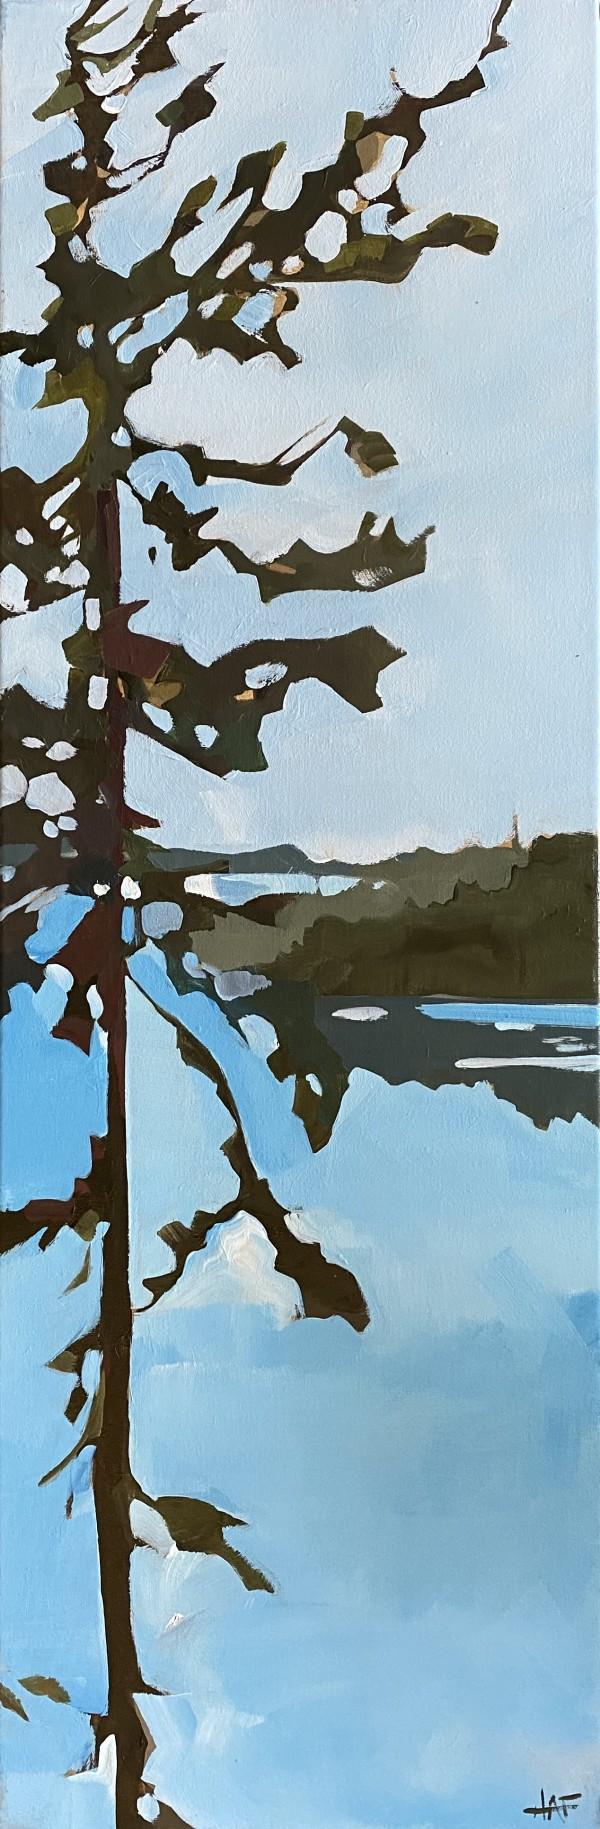 Pine near Scout Island by Holly Ann Friesen